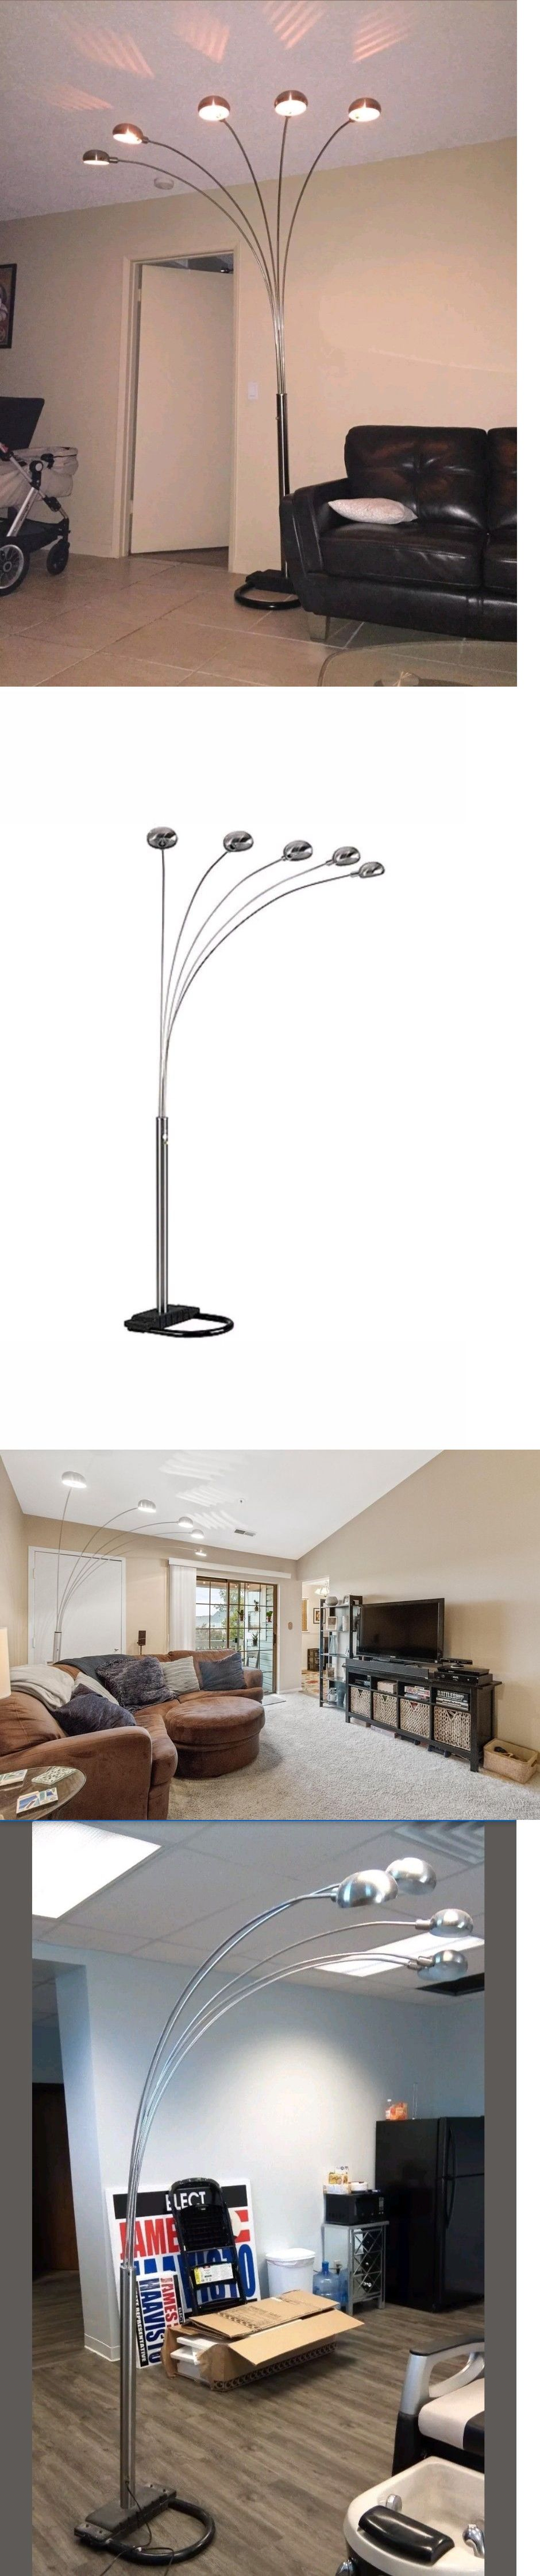 Lamps 112581 Floor Lamp Living Room Lighting Adjustable 5 Arm Arch Floor Lamp 84 Buy Living Room Floor Lamp Lighting Living Room Lighting Arched Floor Lamp